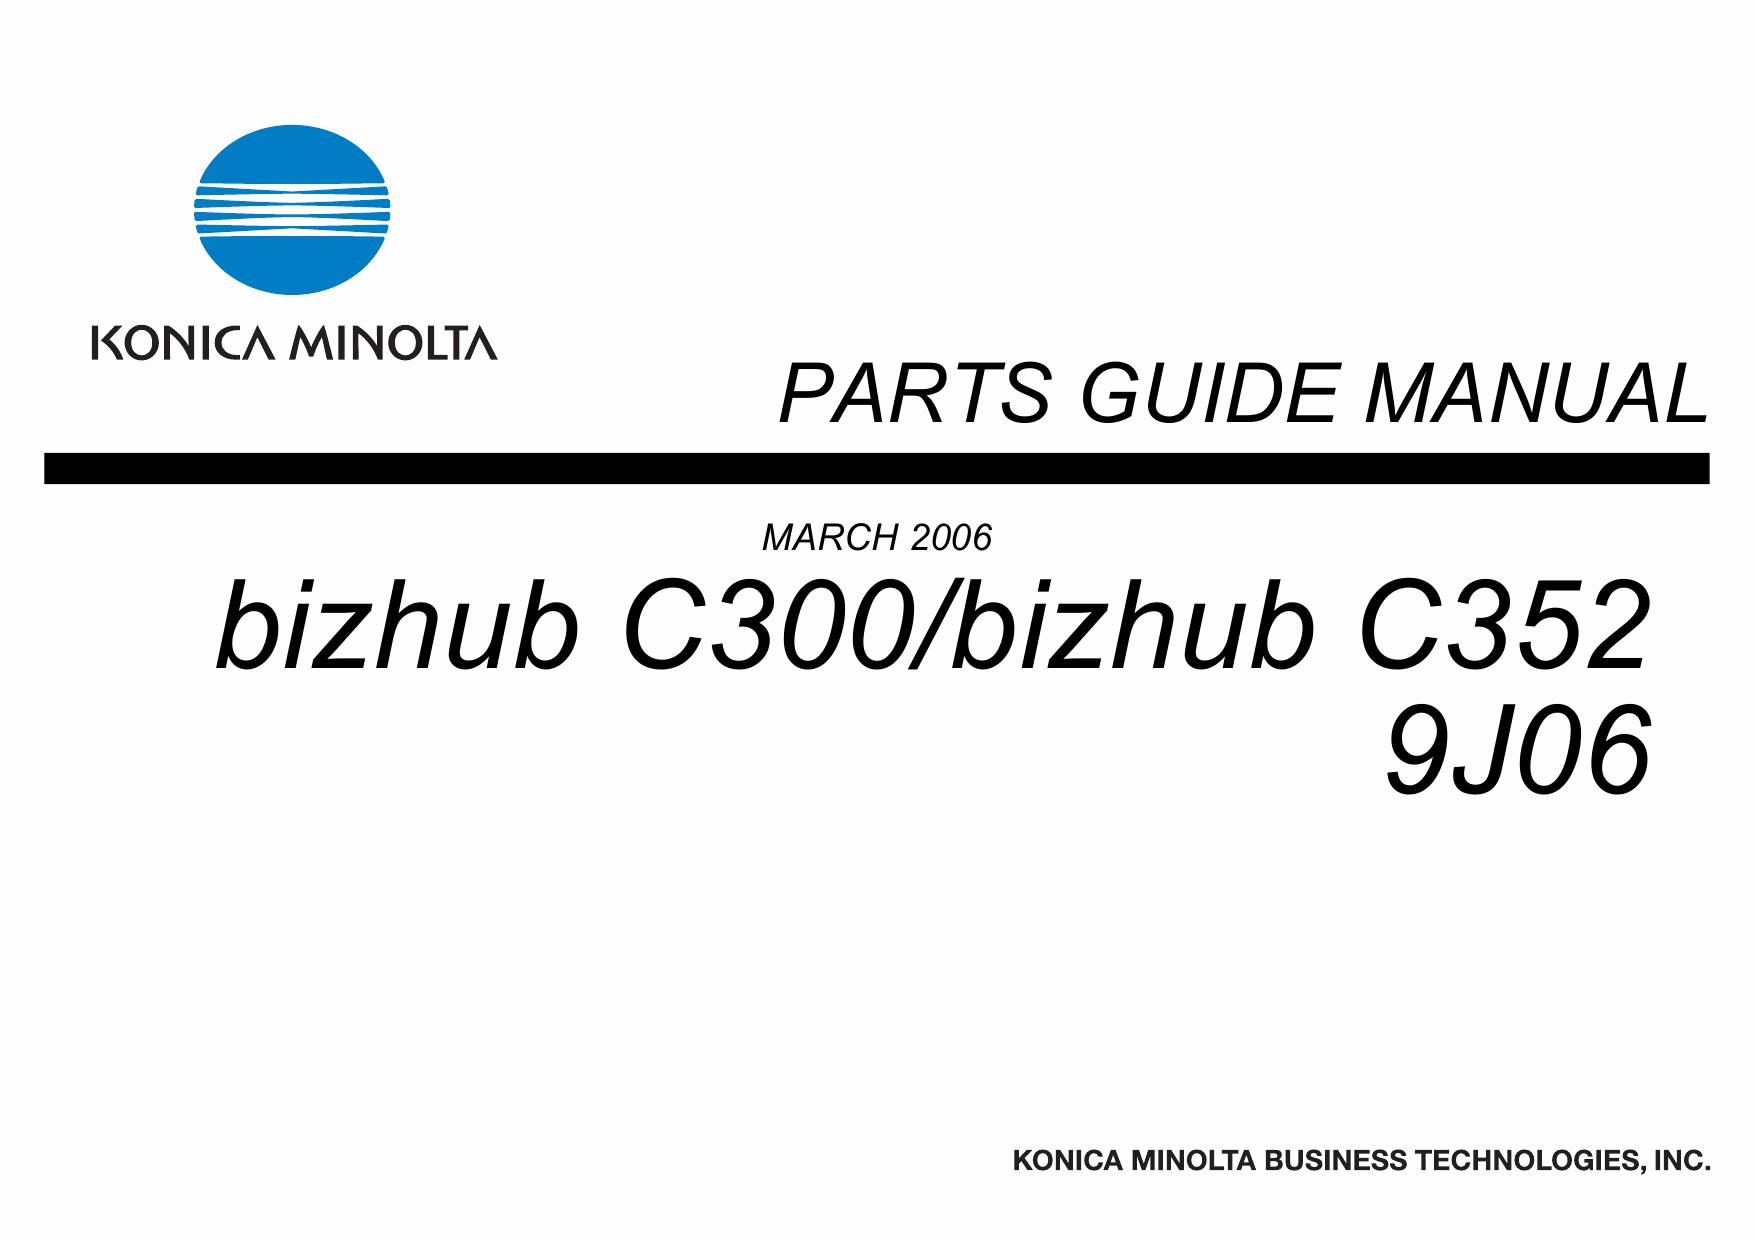 konica minolta bizhub c300 bizhub c352 service repair manual rh 4free articles com Bizhub C552 Bizhub C360